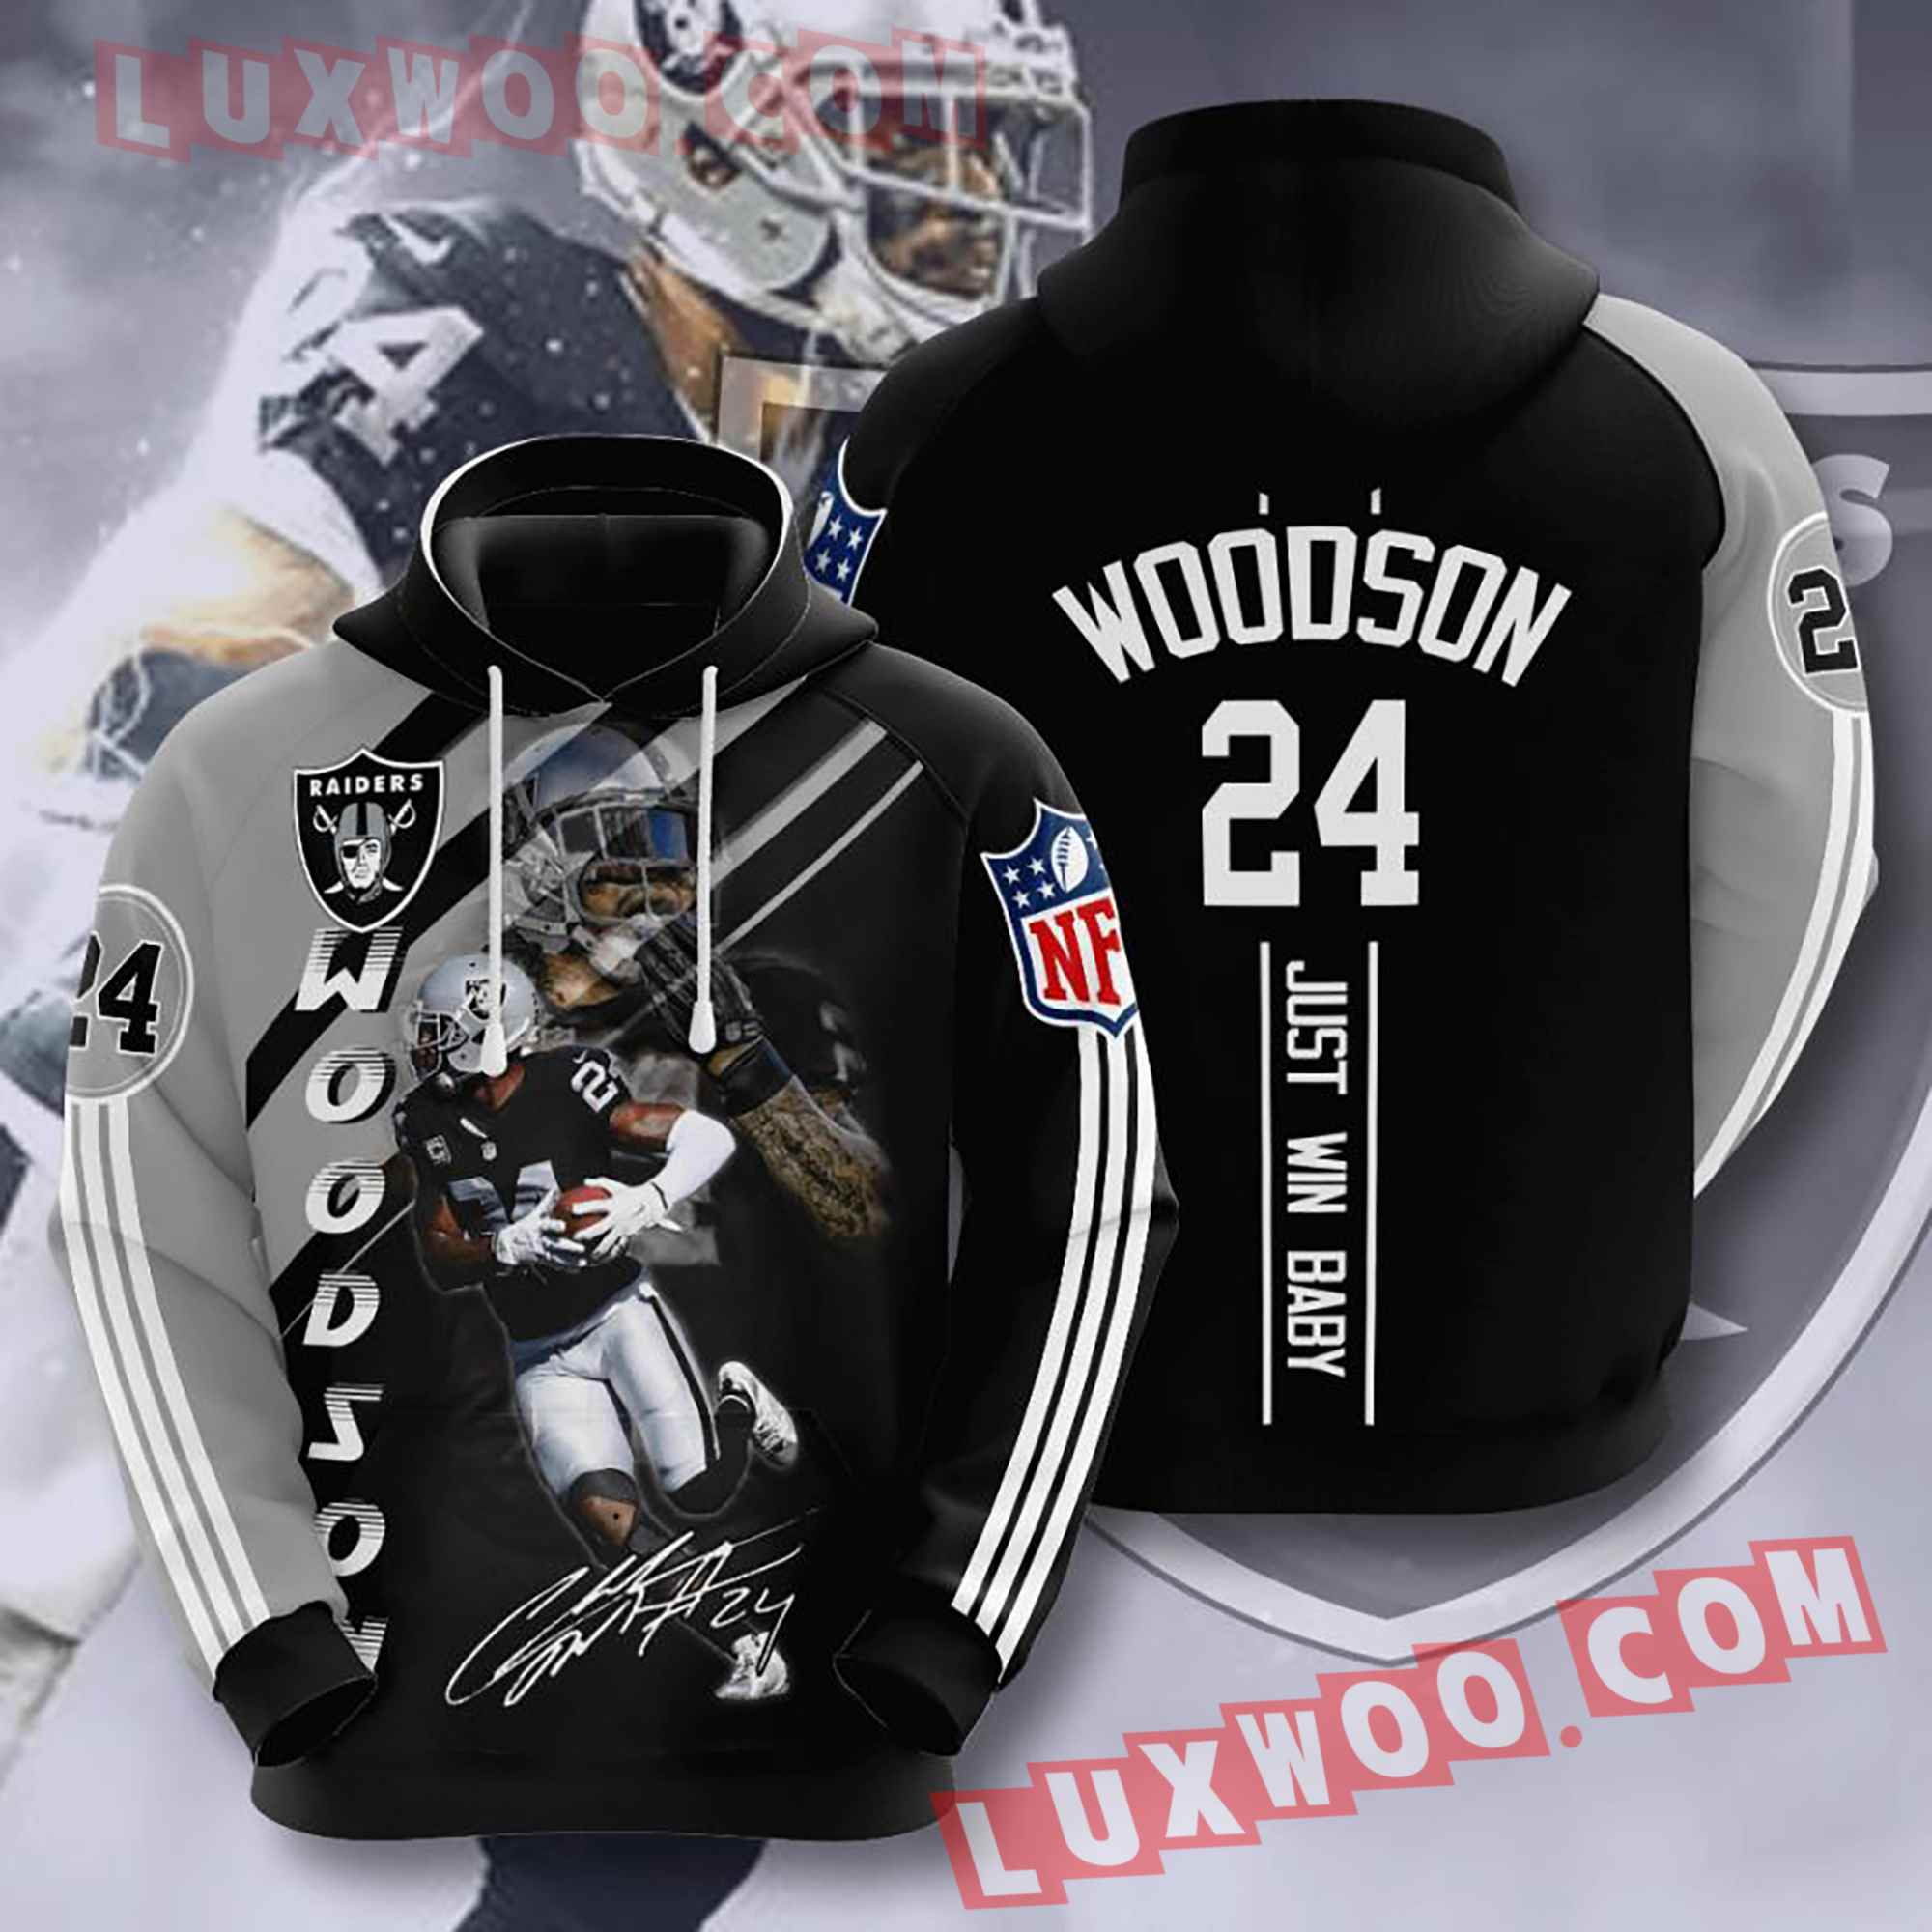 Oakland Raiders Nfl Custom All Over Print 3d Pullover Hoodie V12